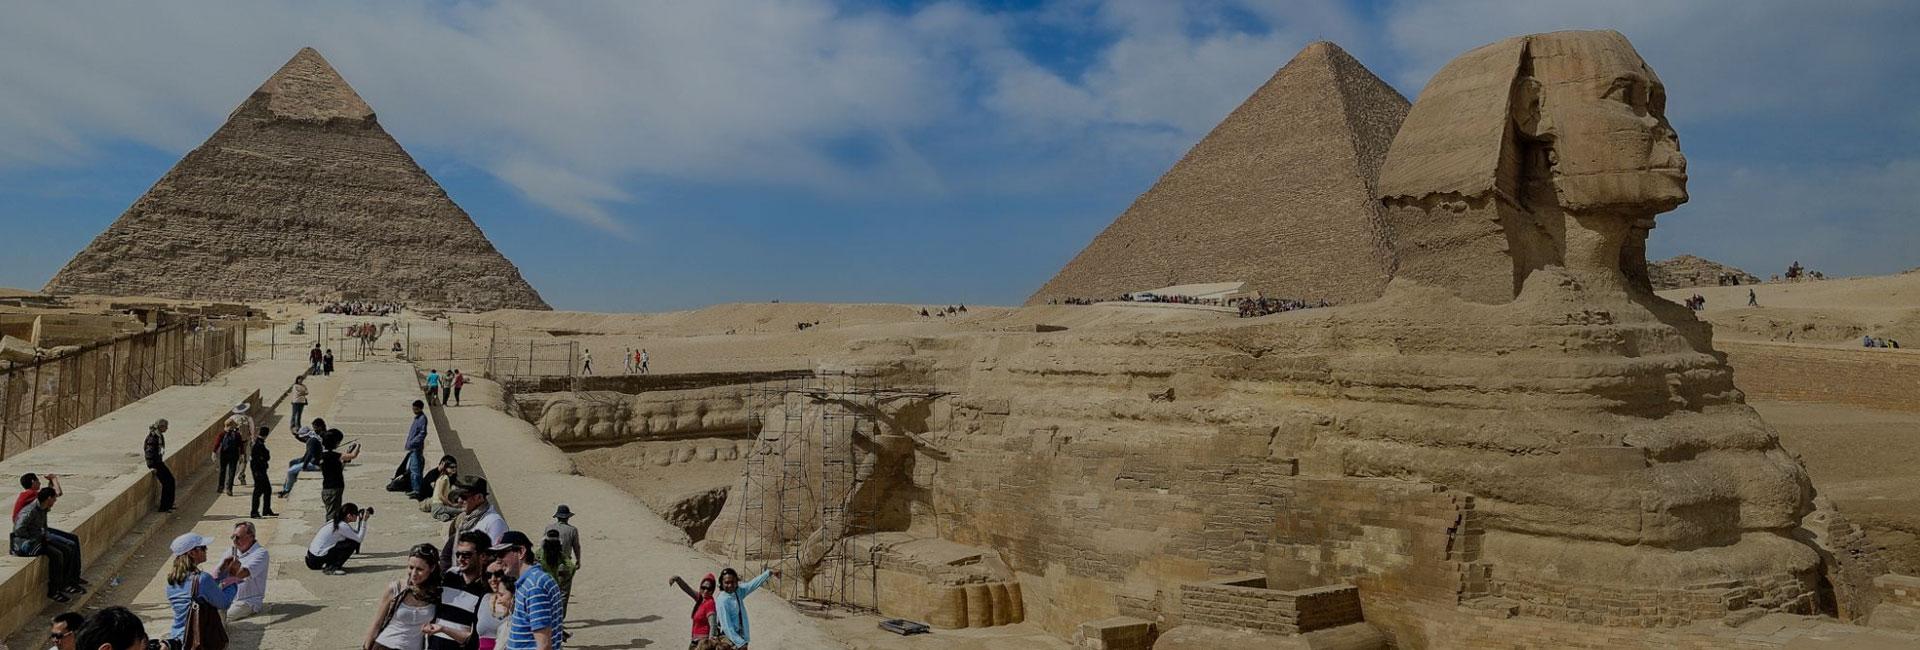 Giza pyramids & Egyptian Museum